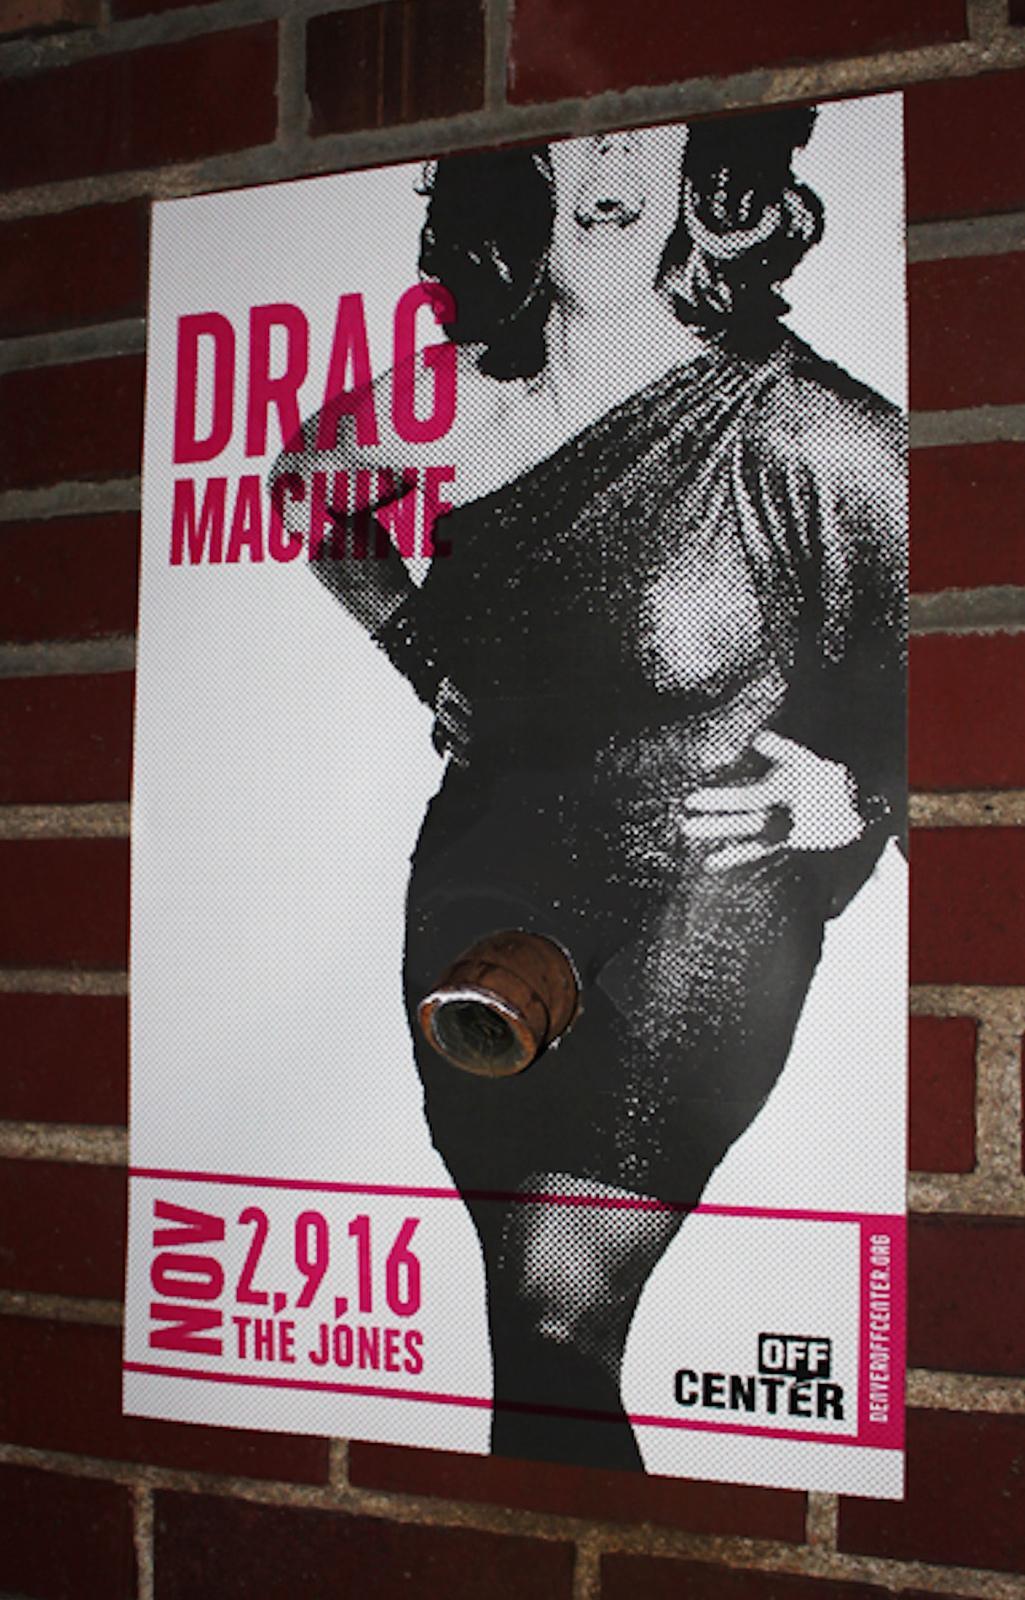 Off-Center Outdoor Ad -  Drag Machine, 1